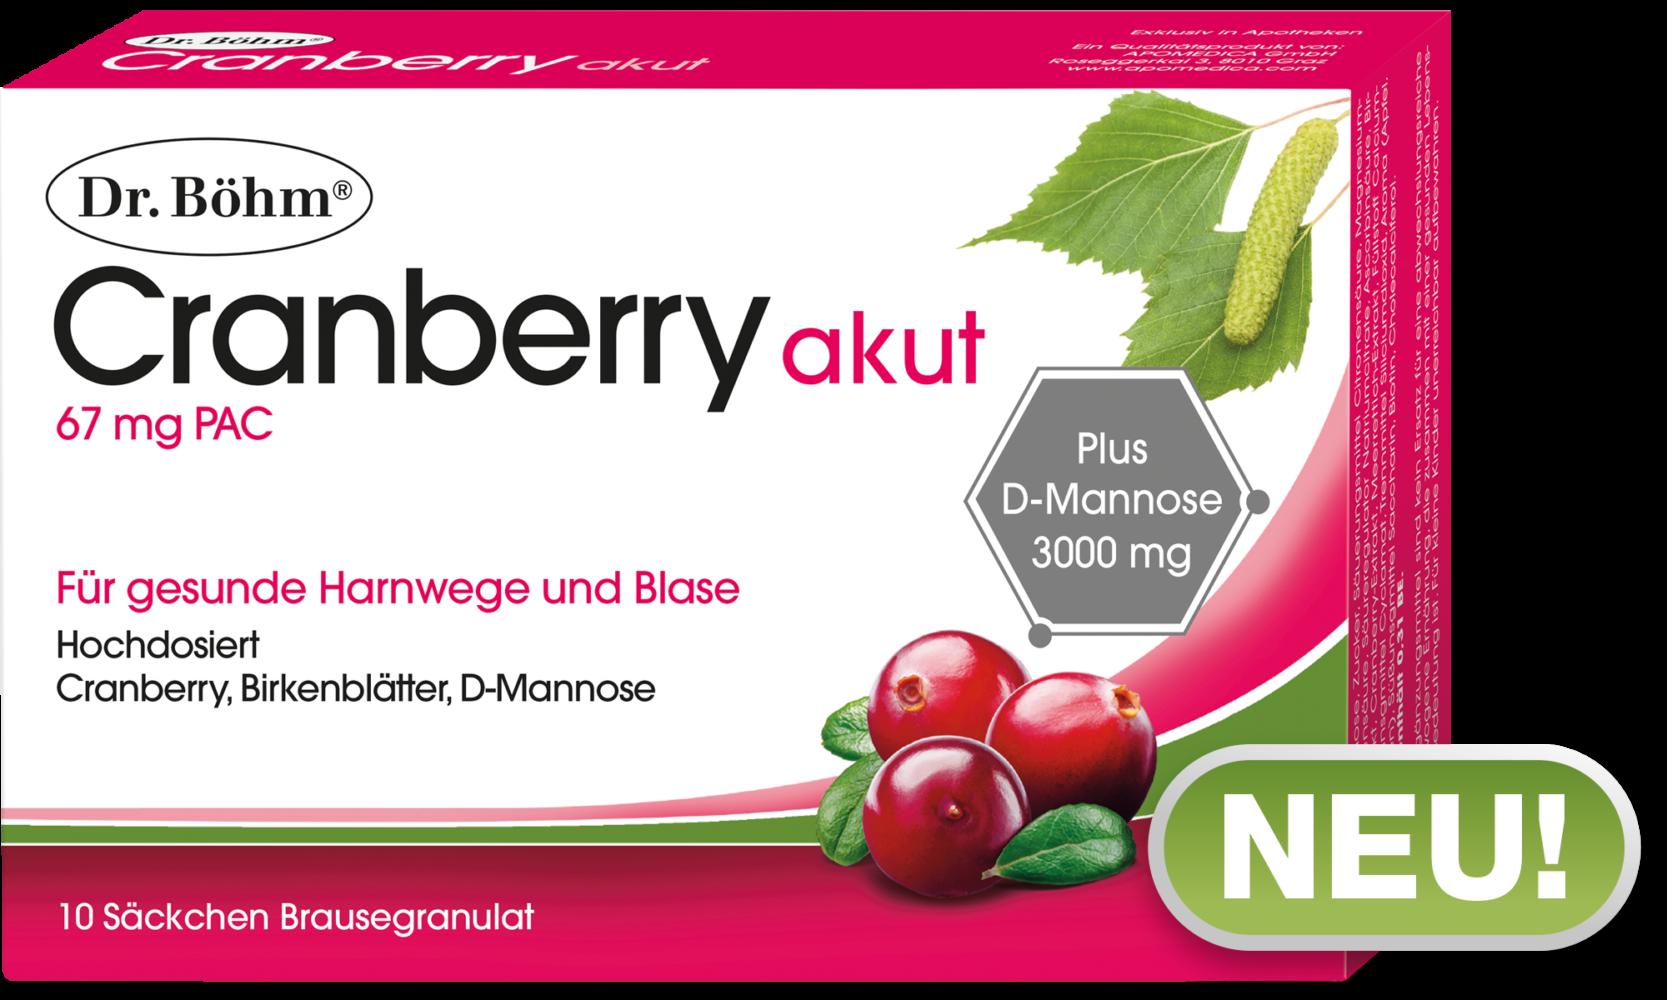 Dr. Böhm® Cranberry akut - gesunde Harnwege und Blase im Akutfall ...